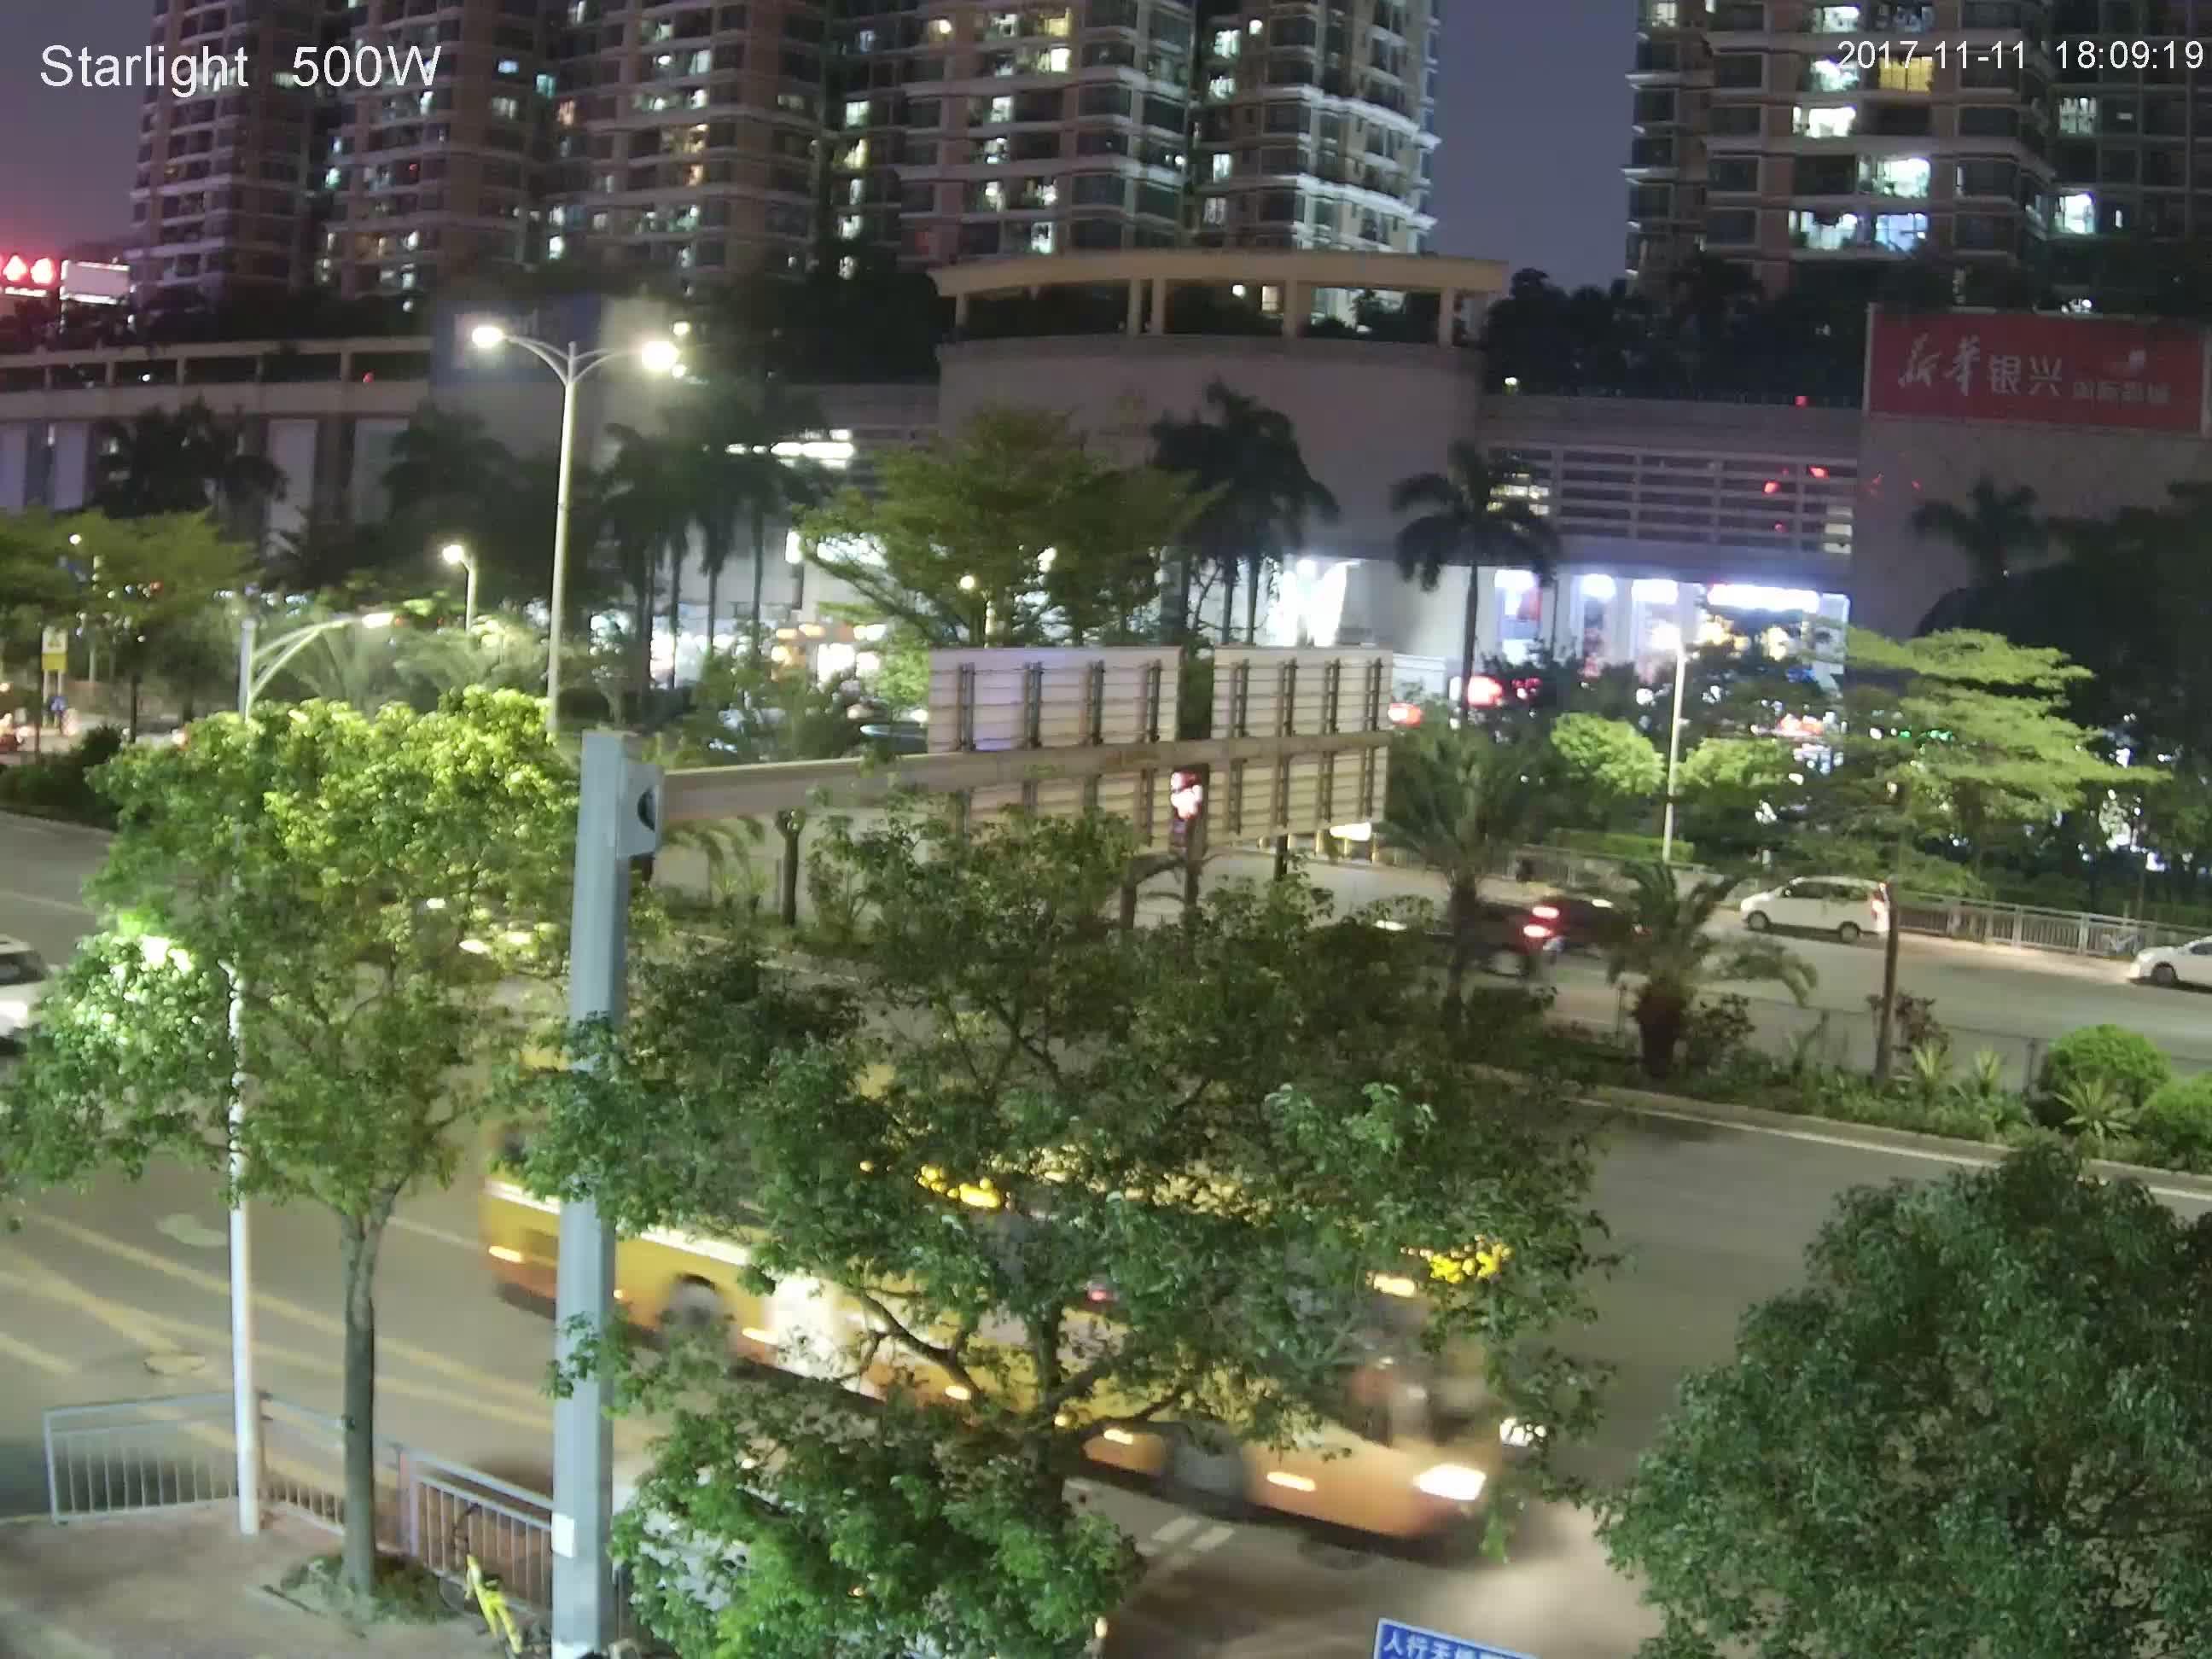 20x Sony Sensor IMX185 Starlight ptz camera